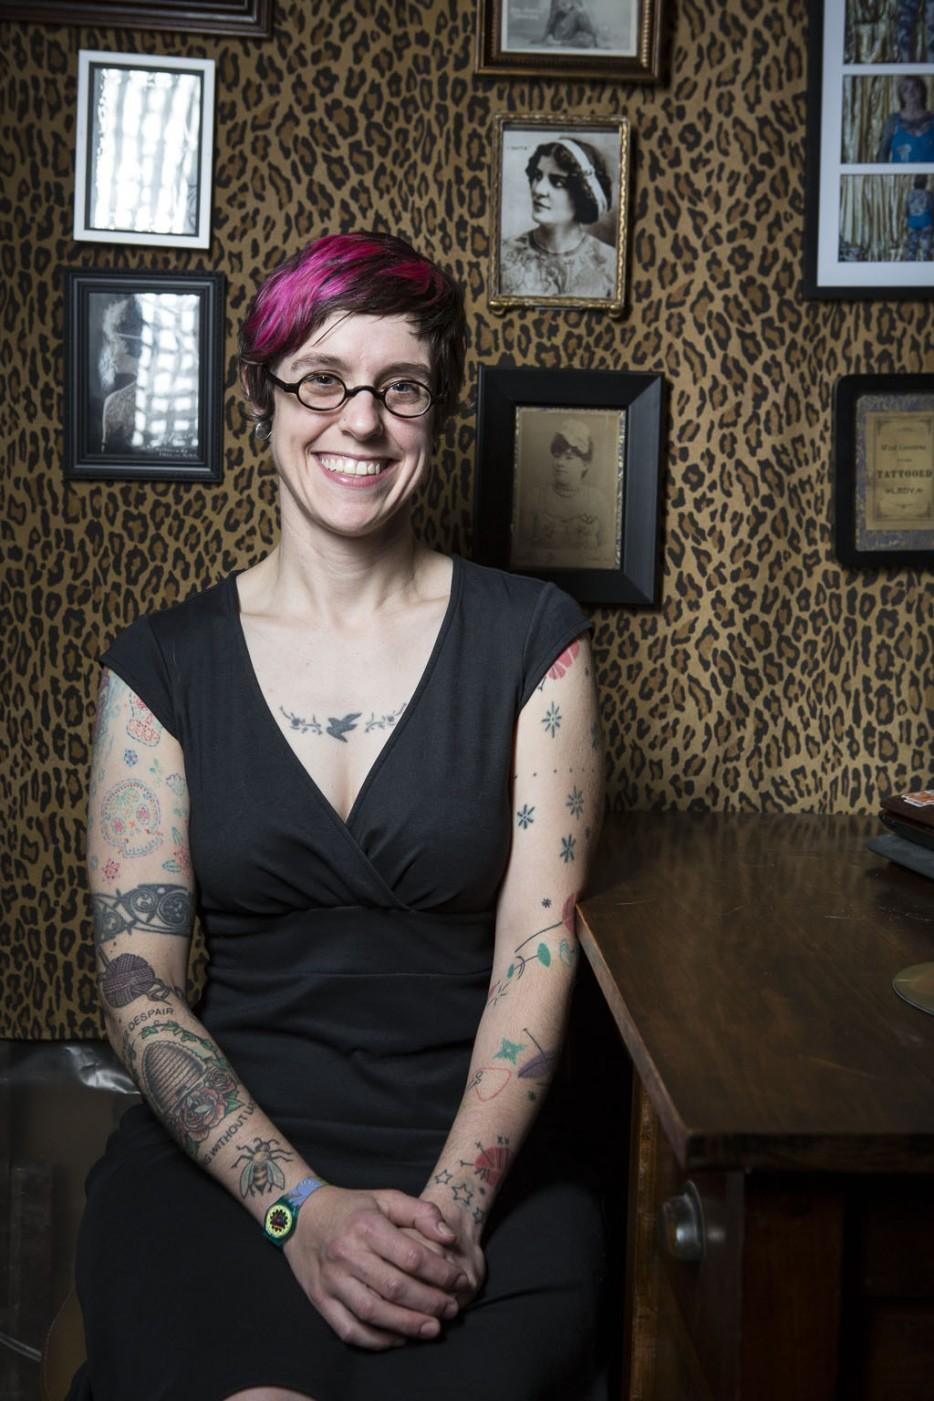 Profesionales con tatuajes 26